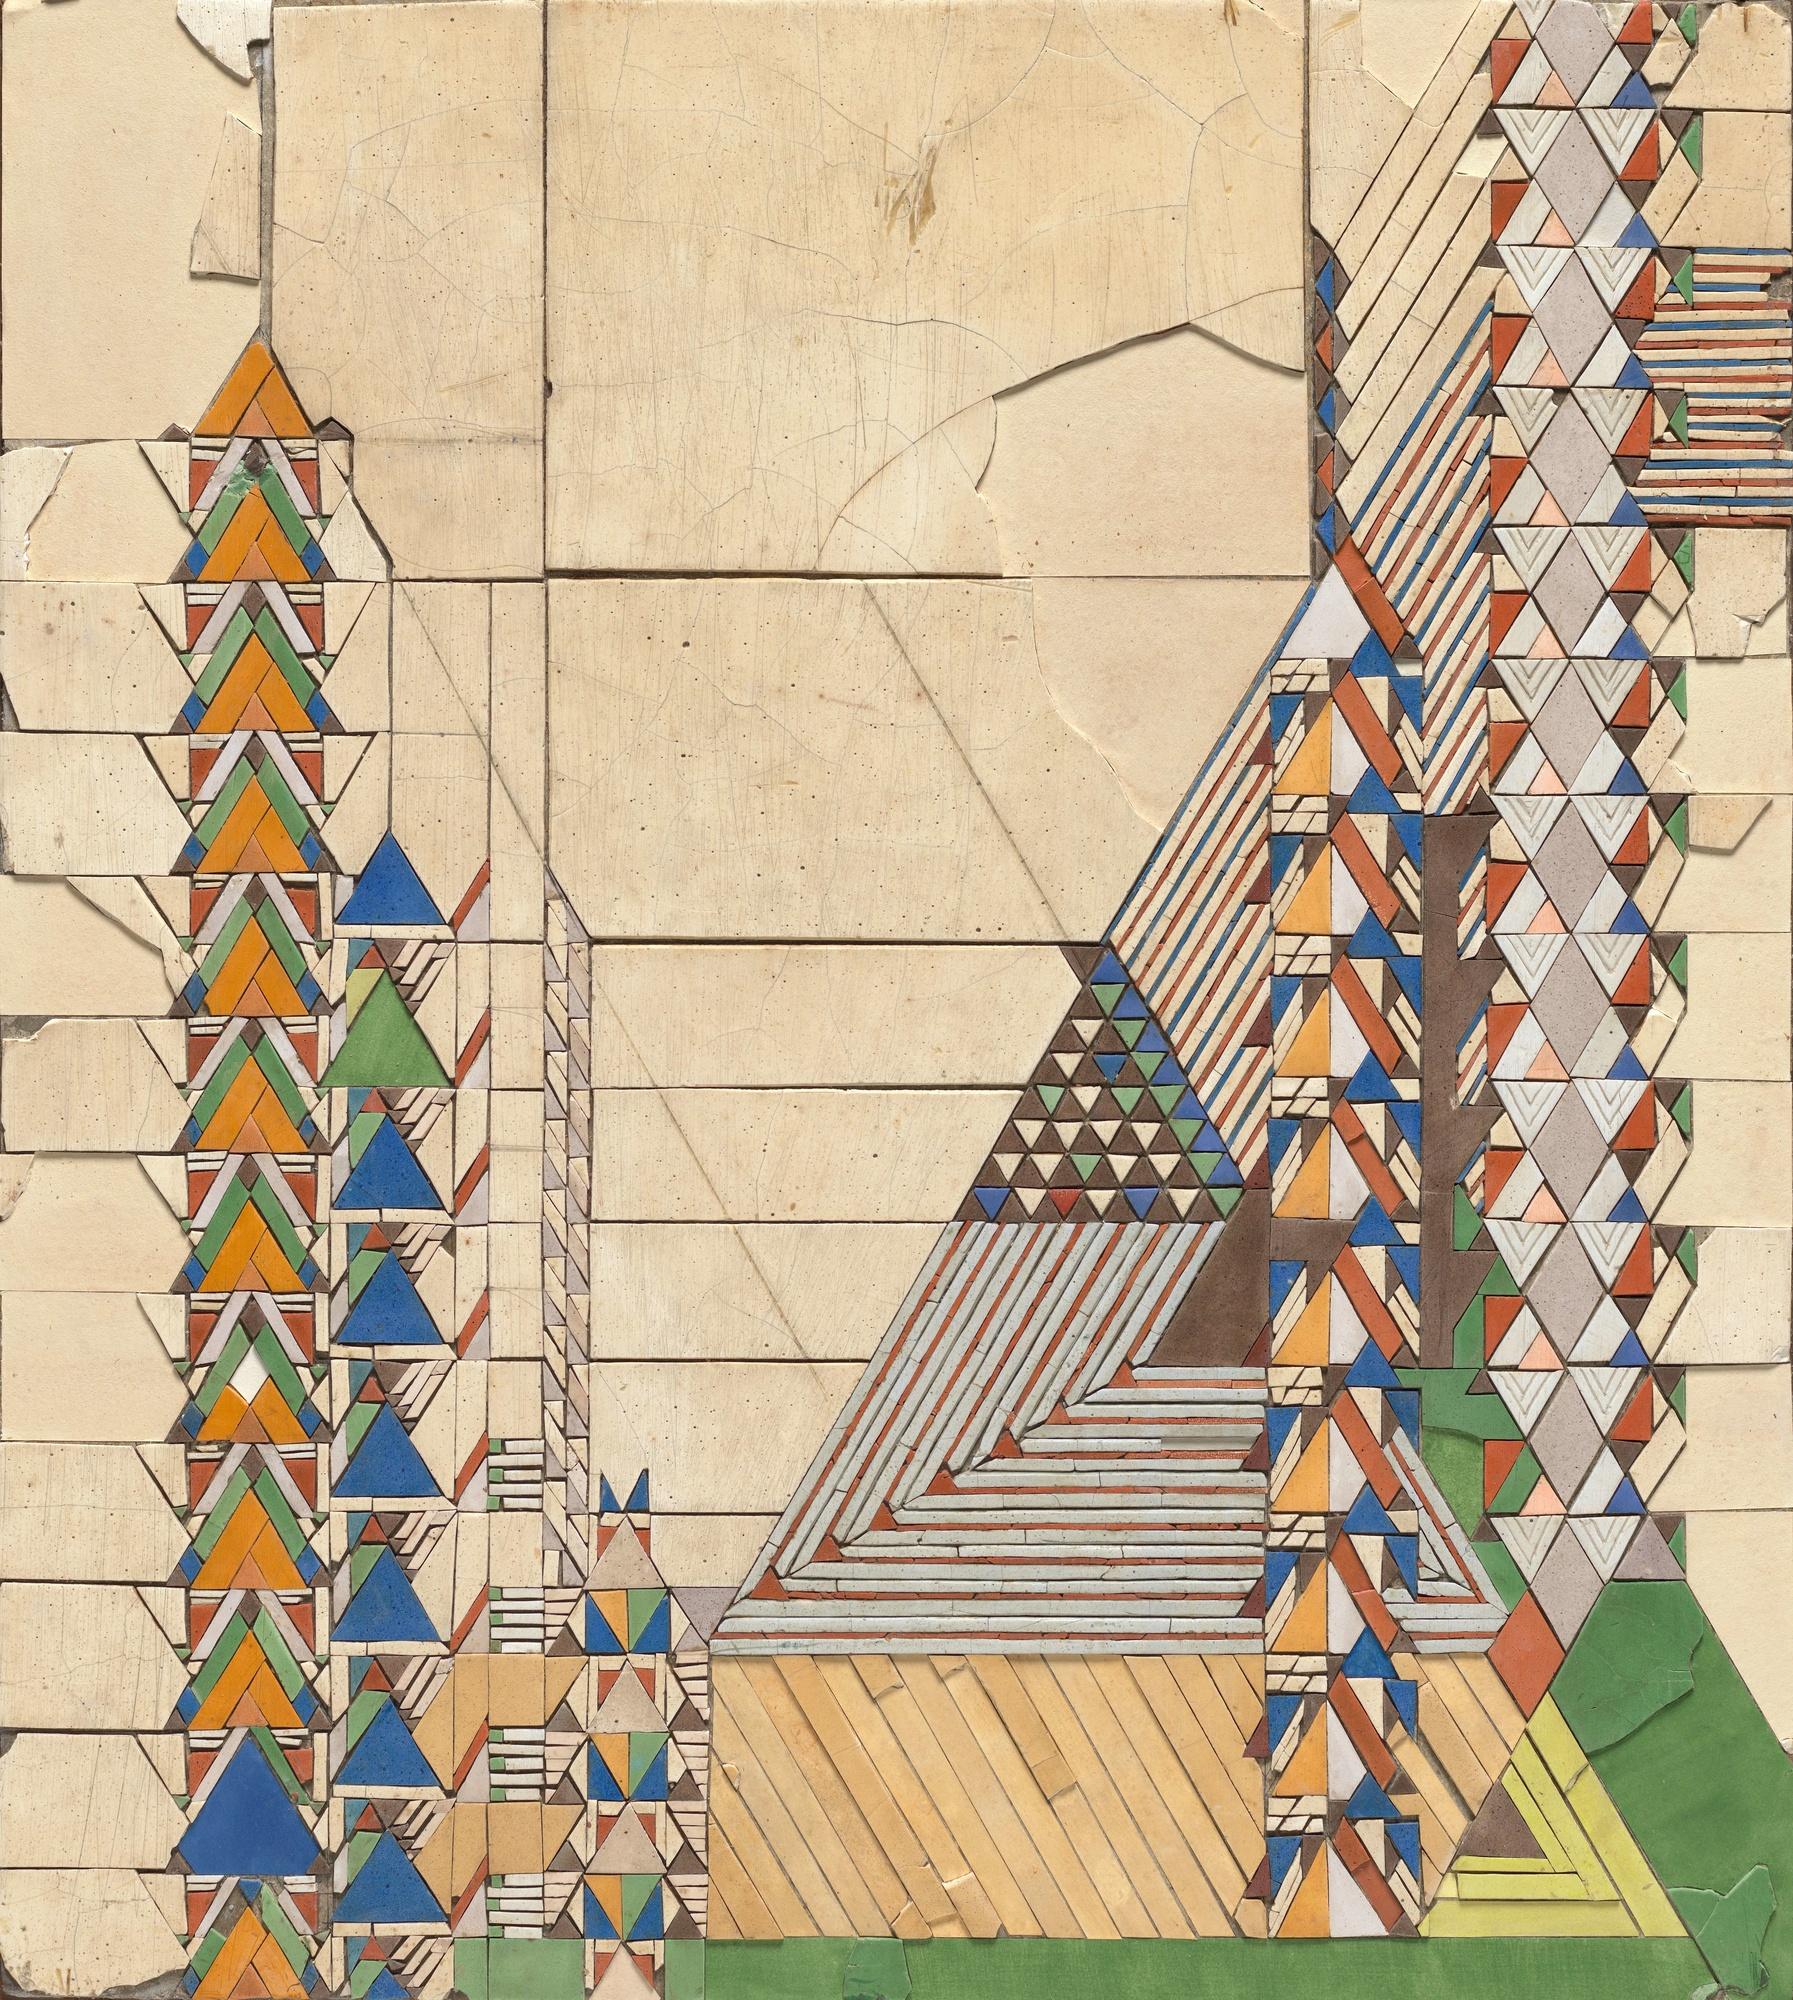 Graphic Design Workshop Frank Lloyd Wright S Language Of Ornament Moma Museum Of Modern Art Frank Lloyd Wright Design Frank Lloyd Wright